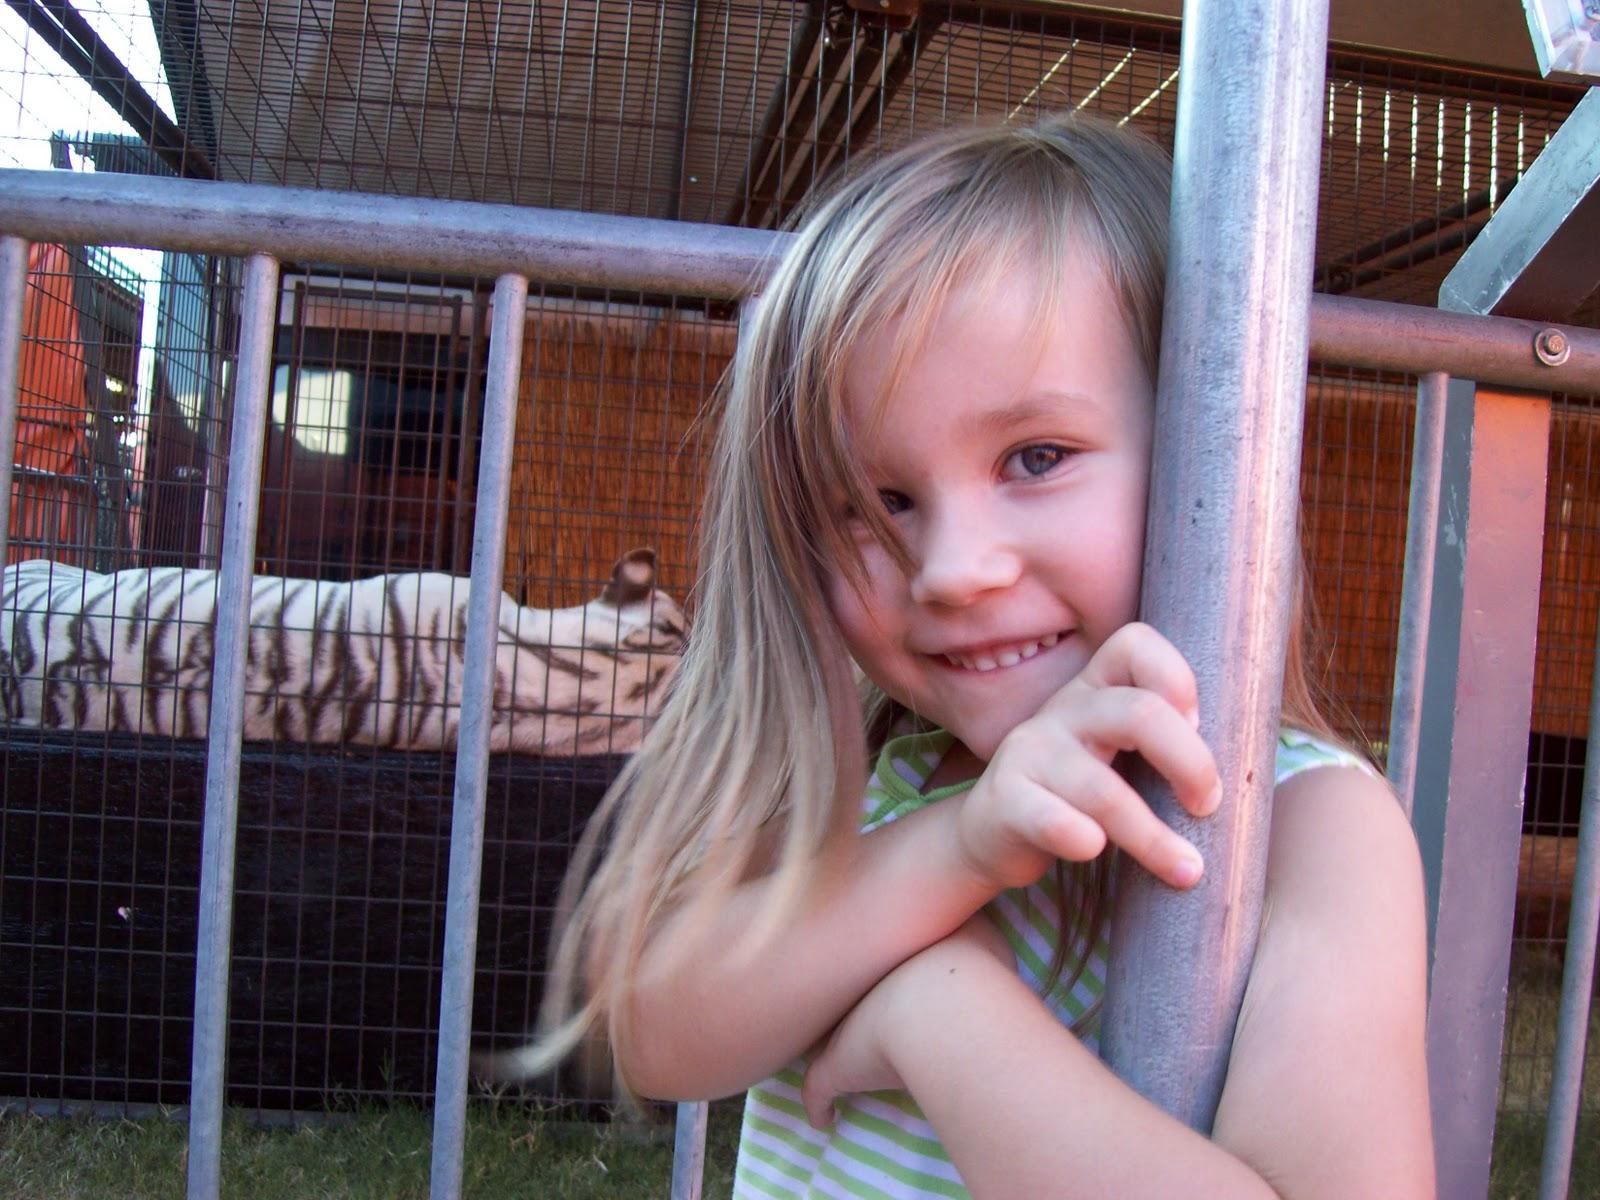 Fort Bend County Fair 2008 - 101_0428.JPG